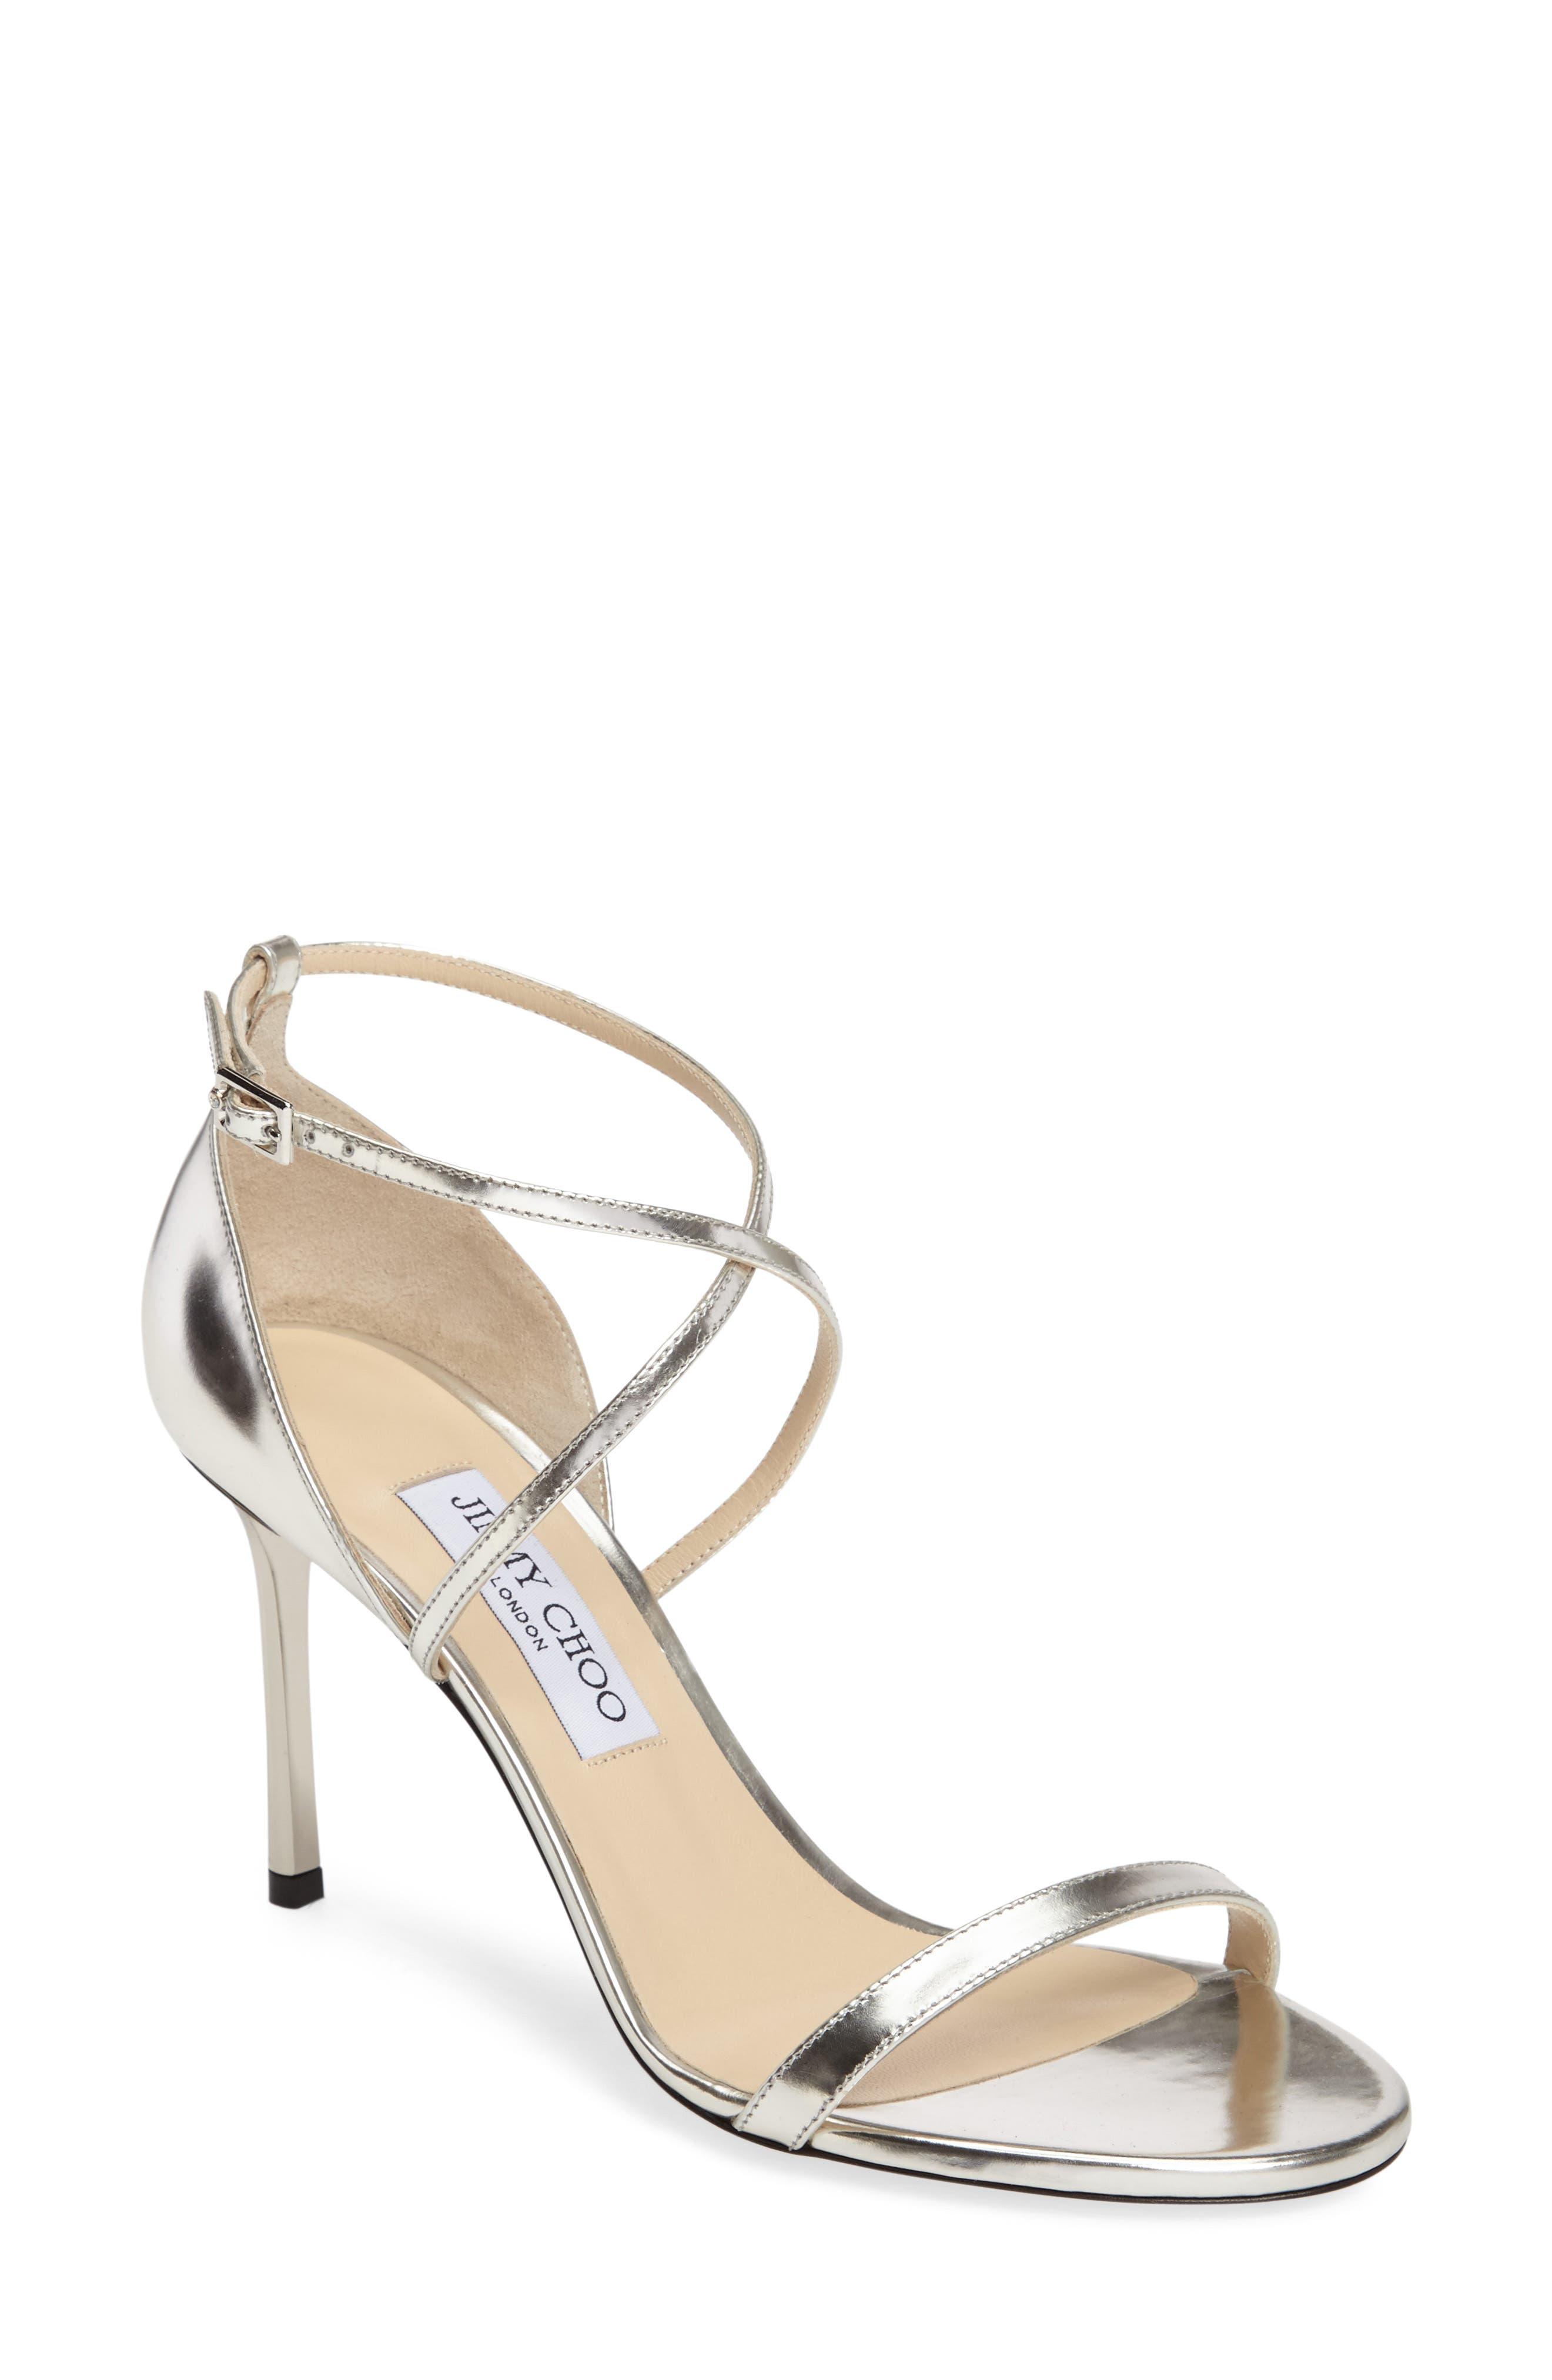 'Hesper' Ankle Strap Sandal, Main, color, 040